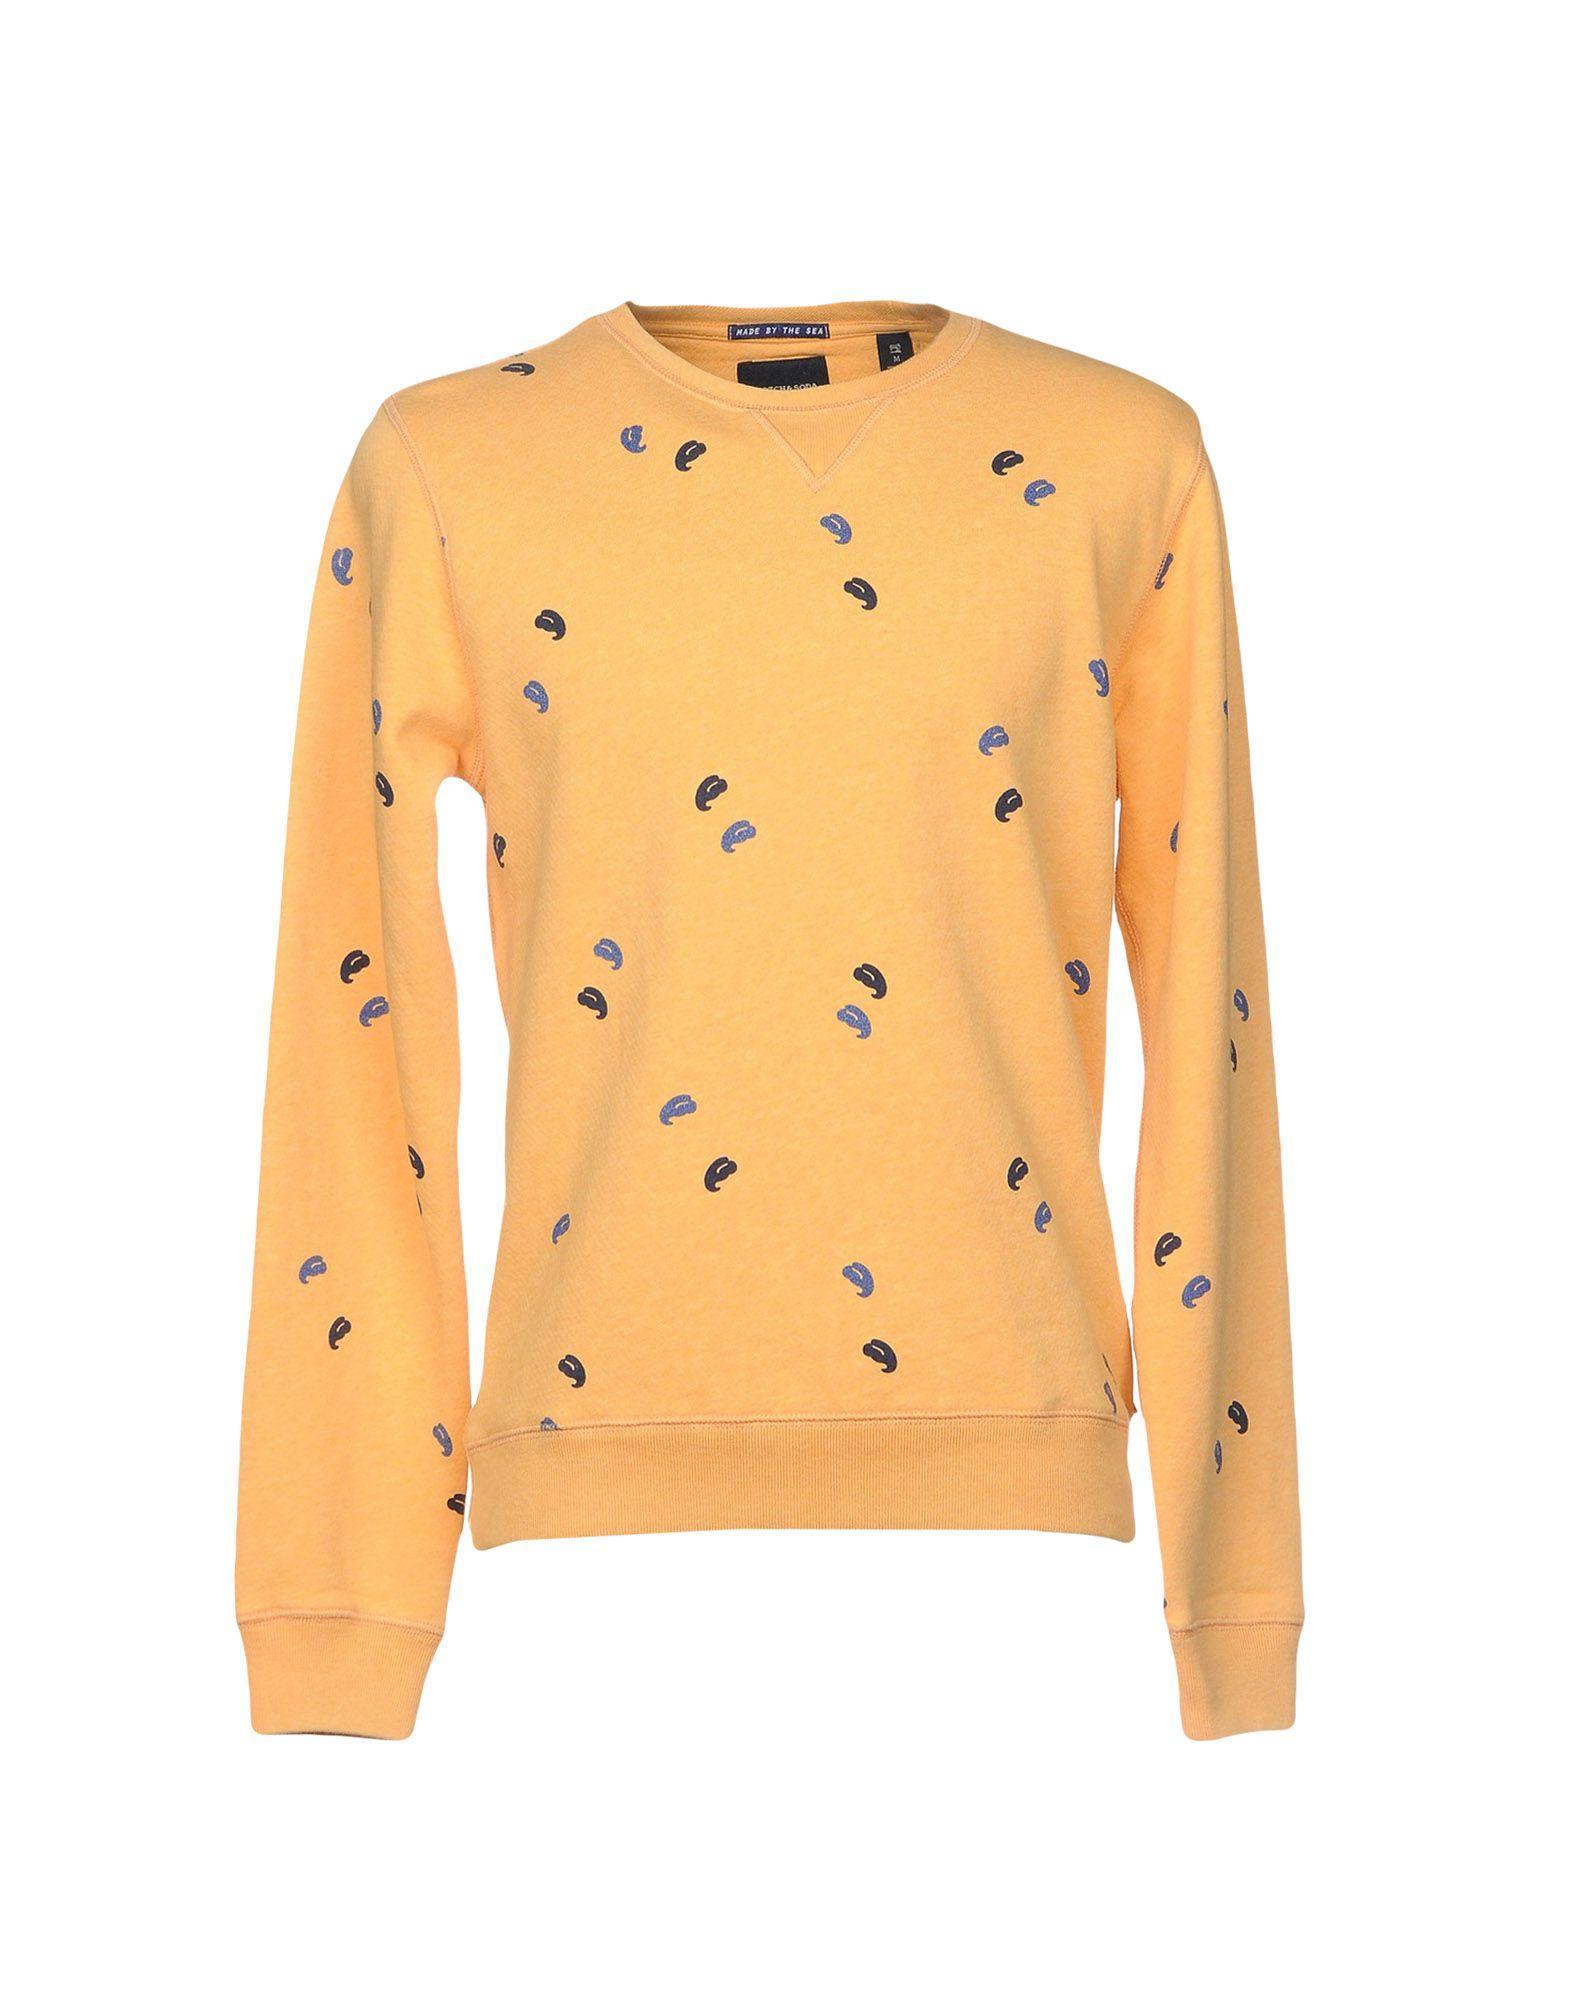 Scotch & Soda Sweatshirt In Yellow